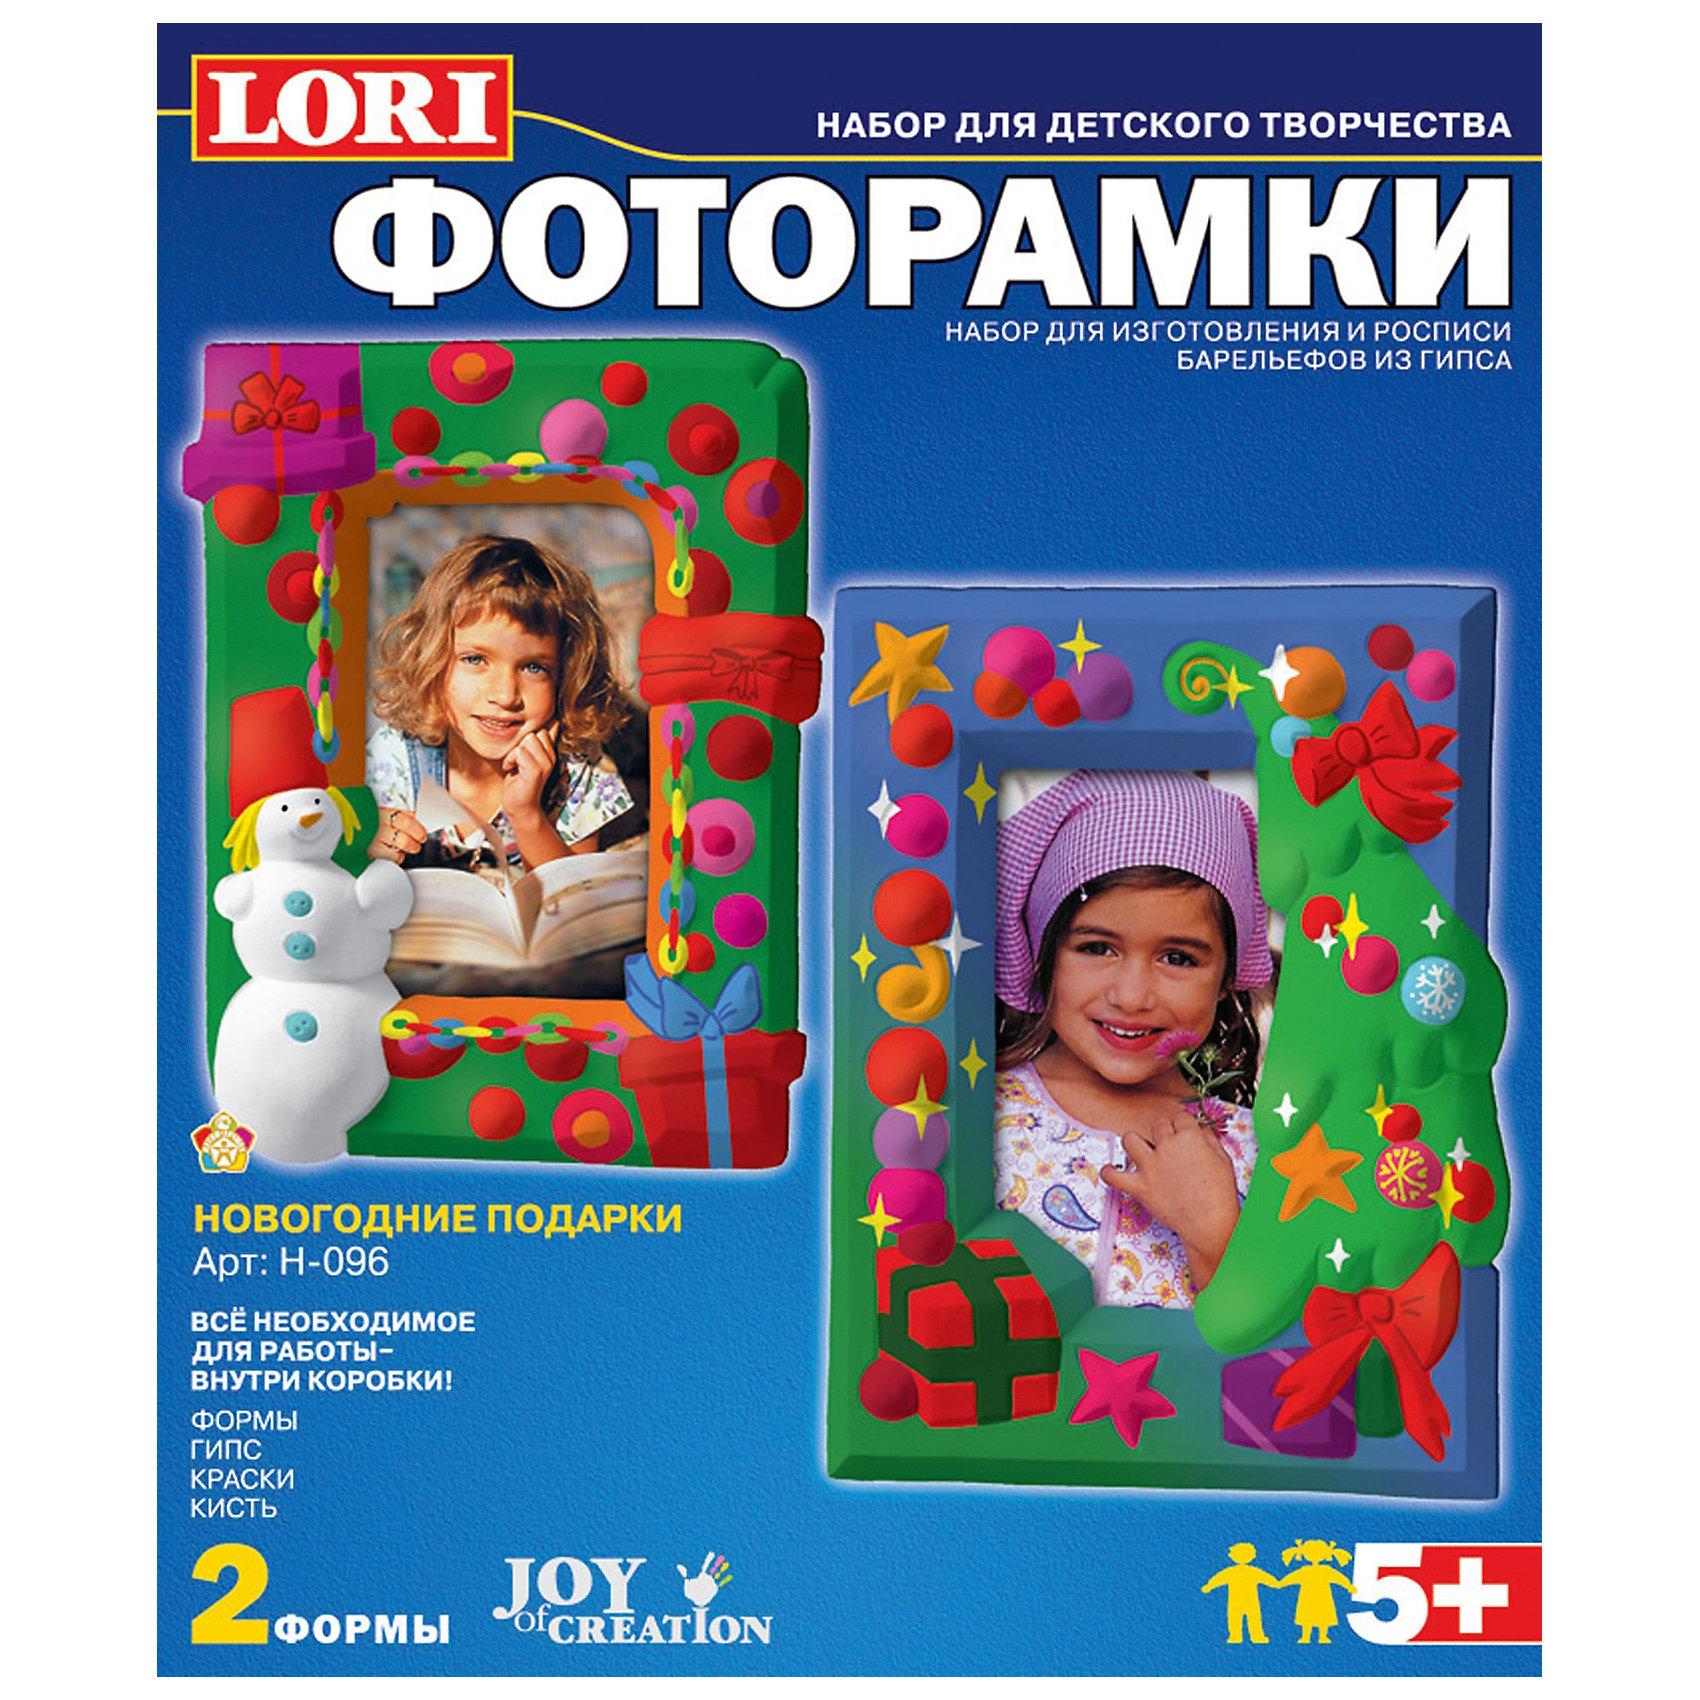 LORI Фоторамки из гипса «Новогодние подарки» lori фоторамки из гипса на клумбе